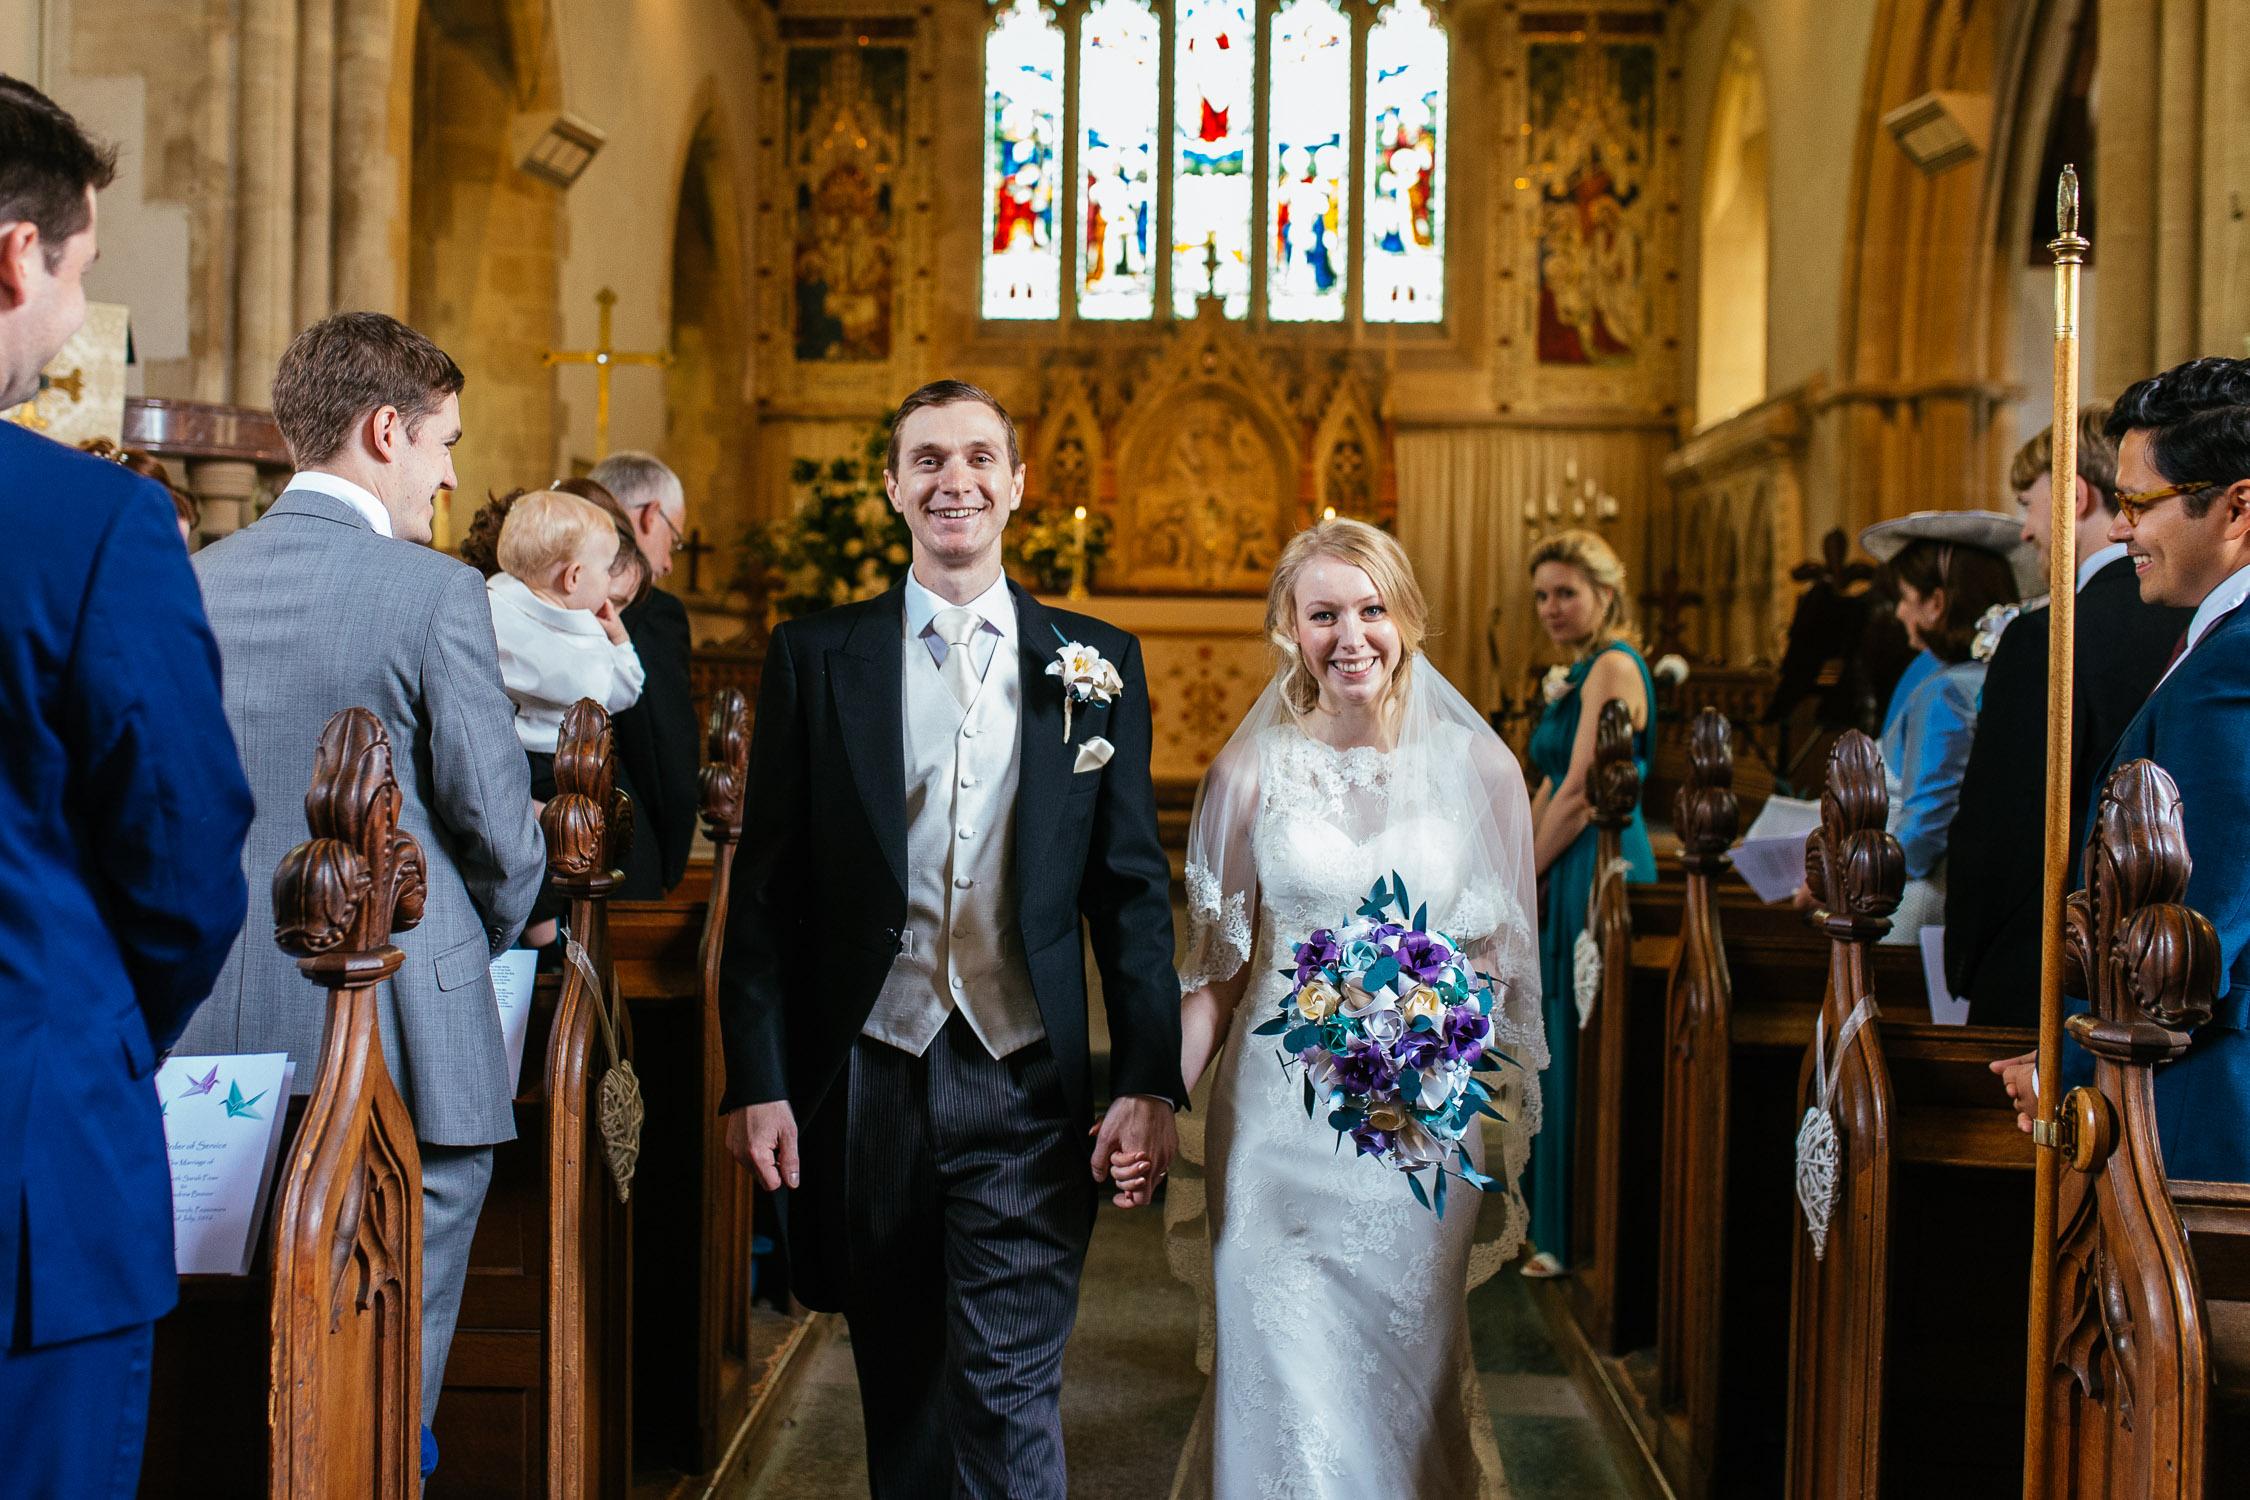 Lizi-and-Mark-Wedding-Highlights-34.jpg